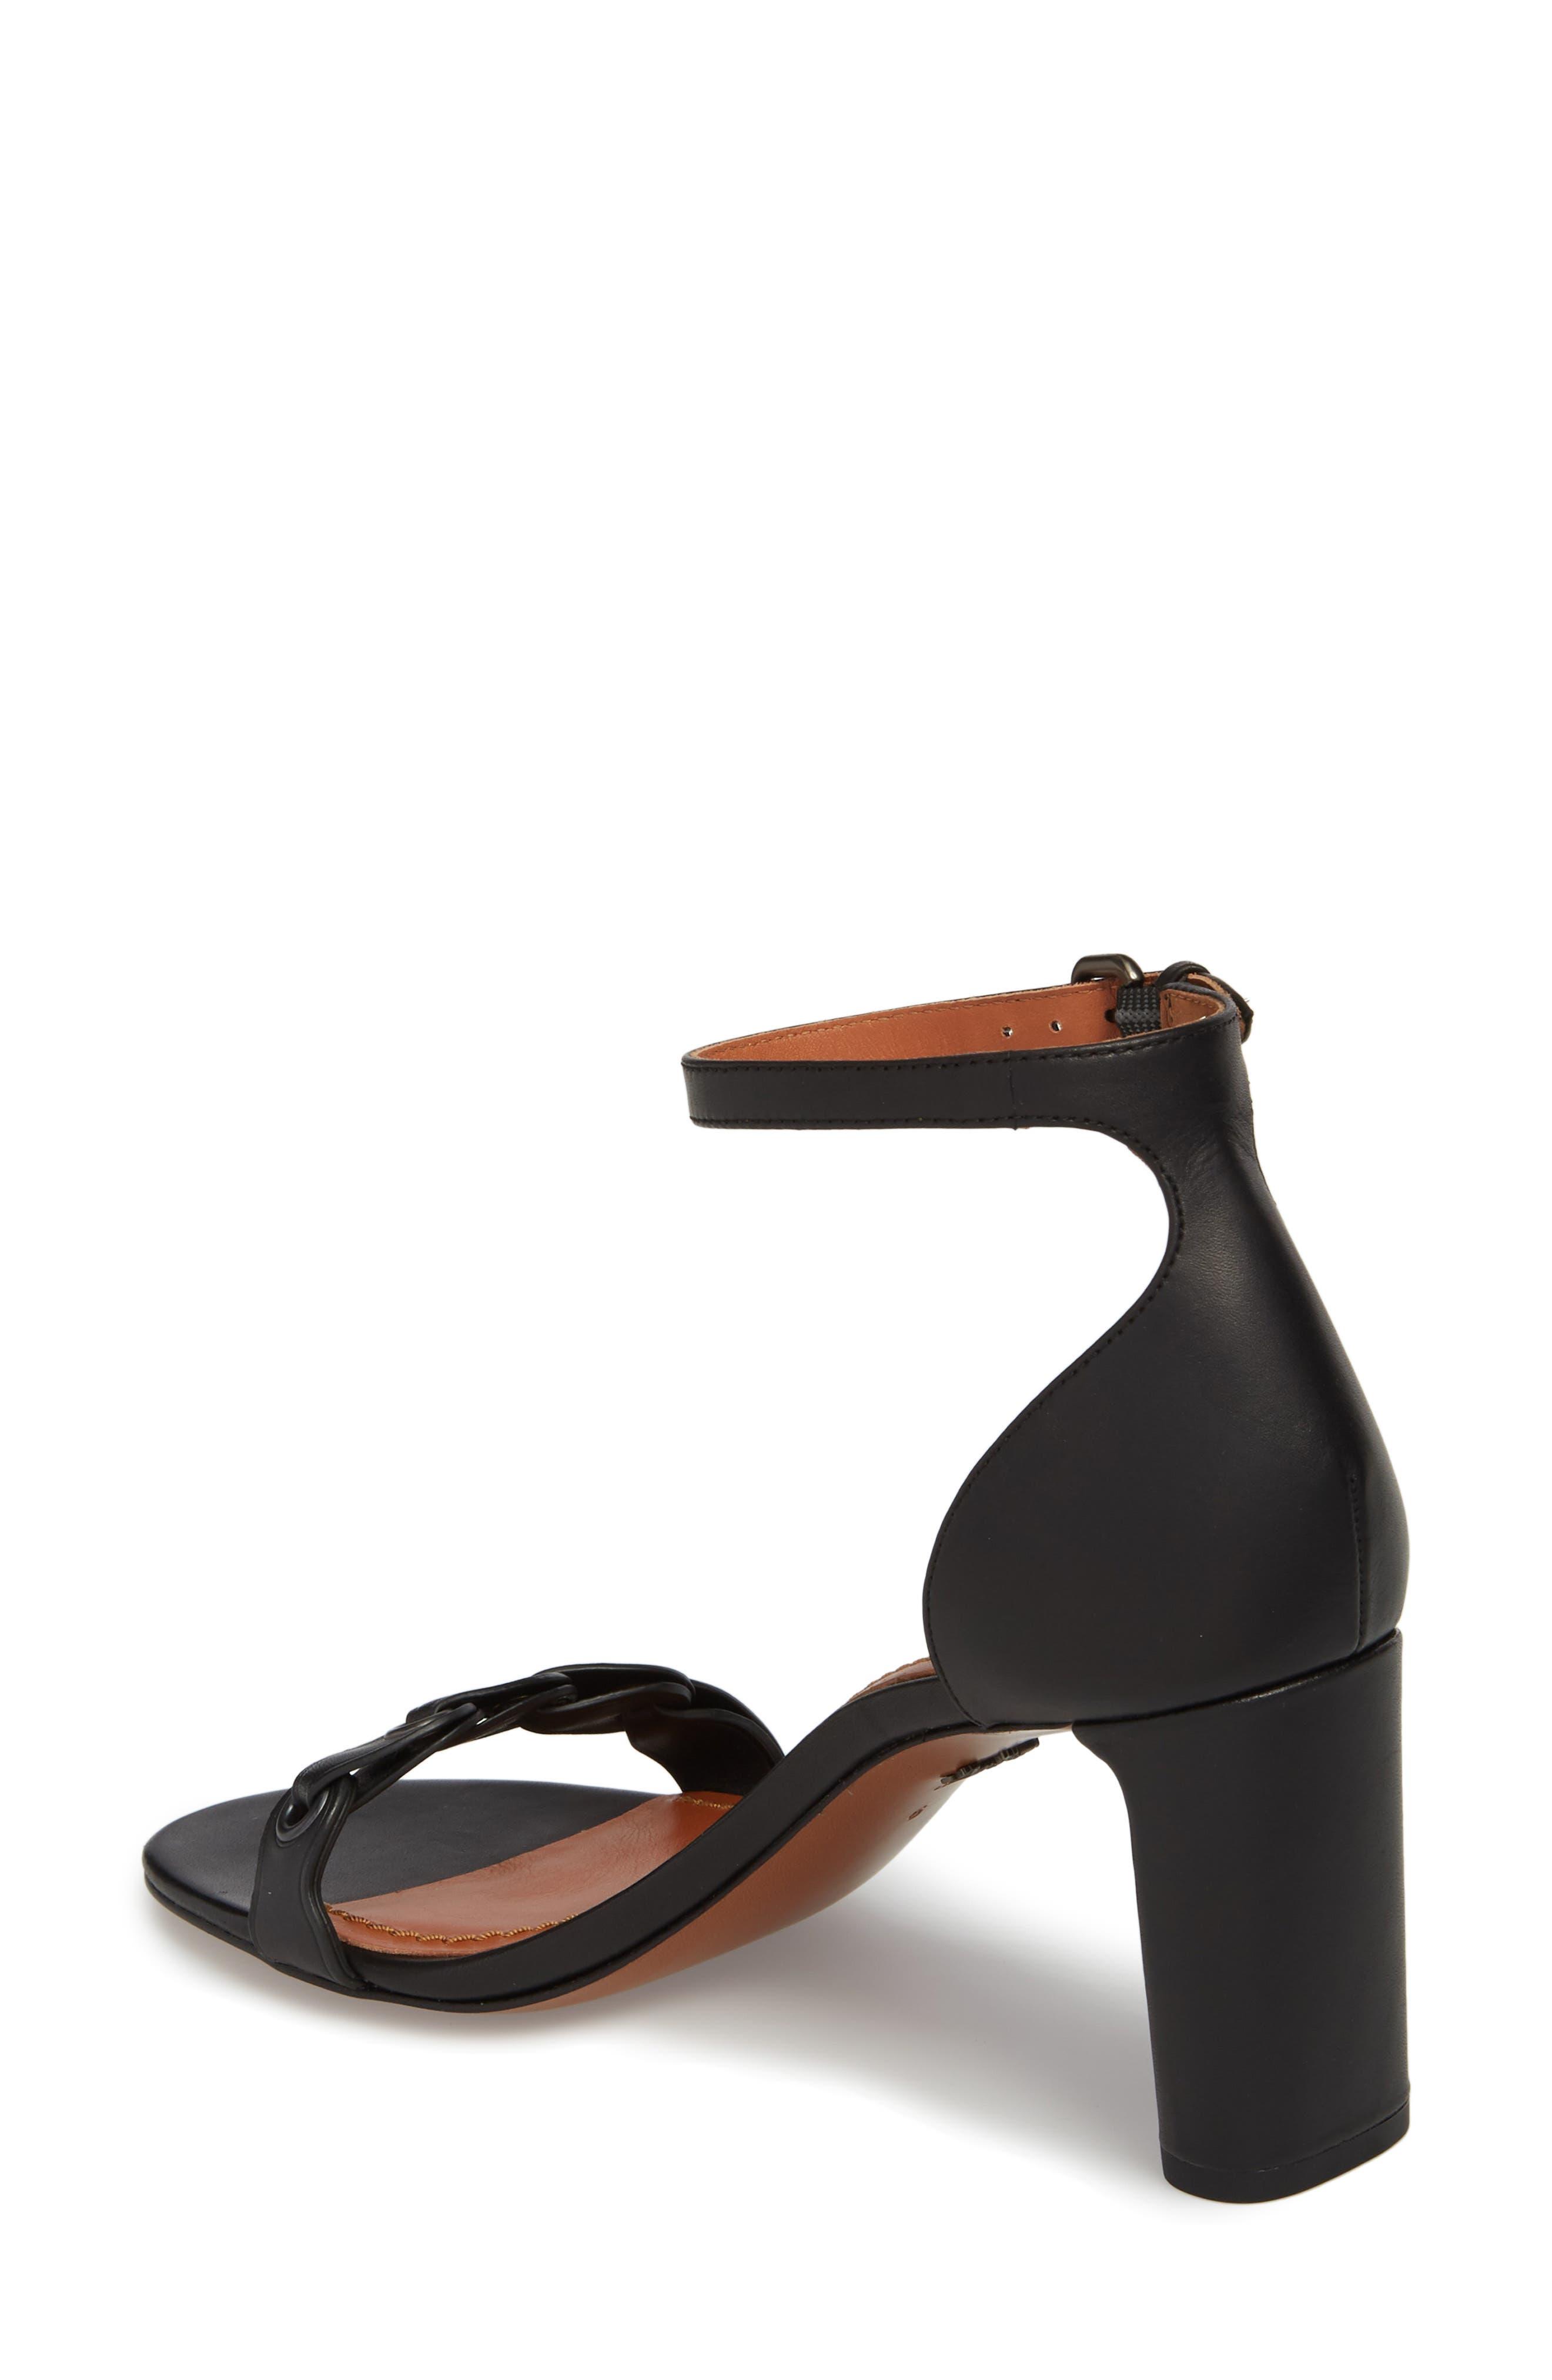 Link Ankle Strap Sandal,                             Alternate thumbnail 2, color,                             Black Leather